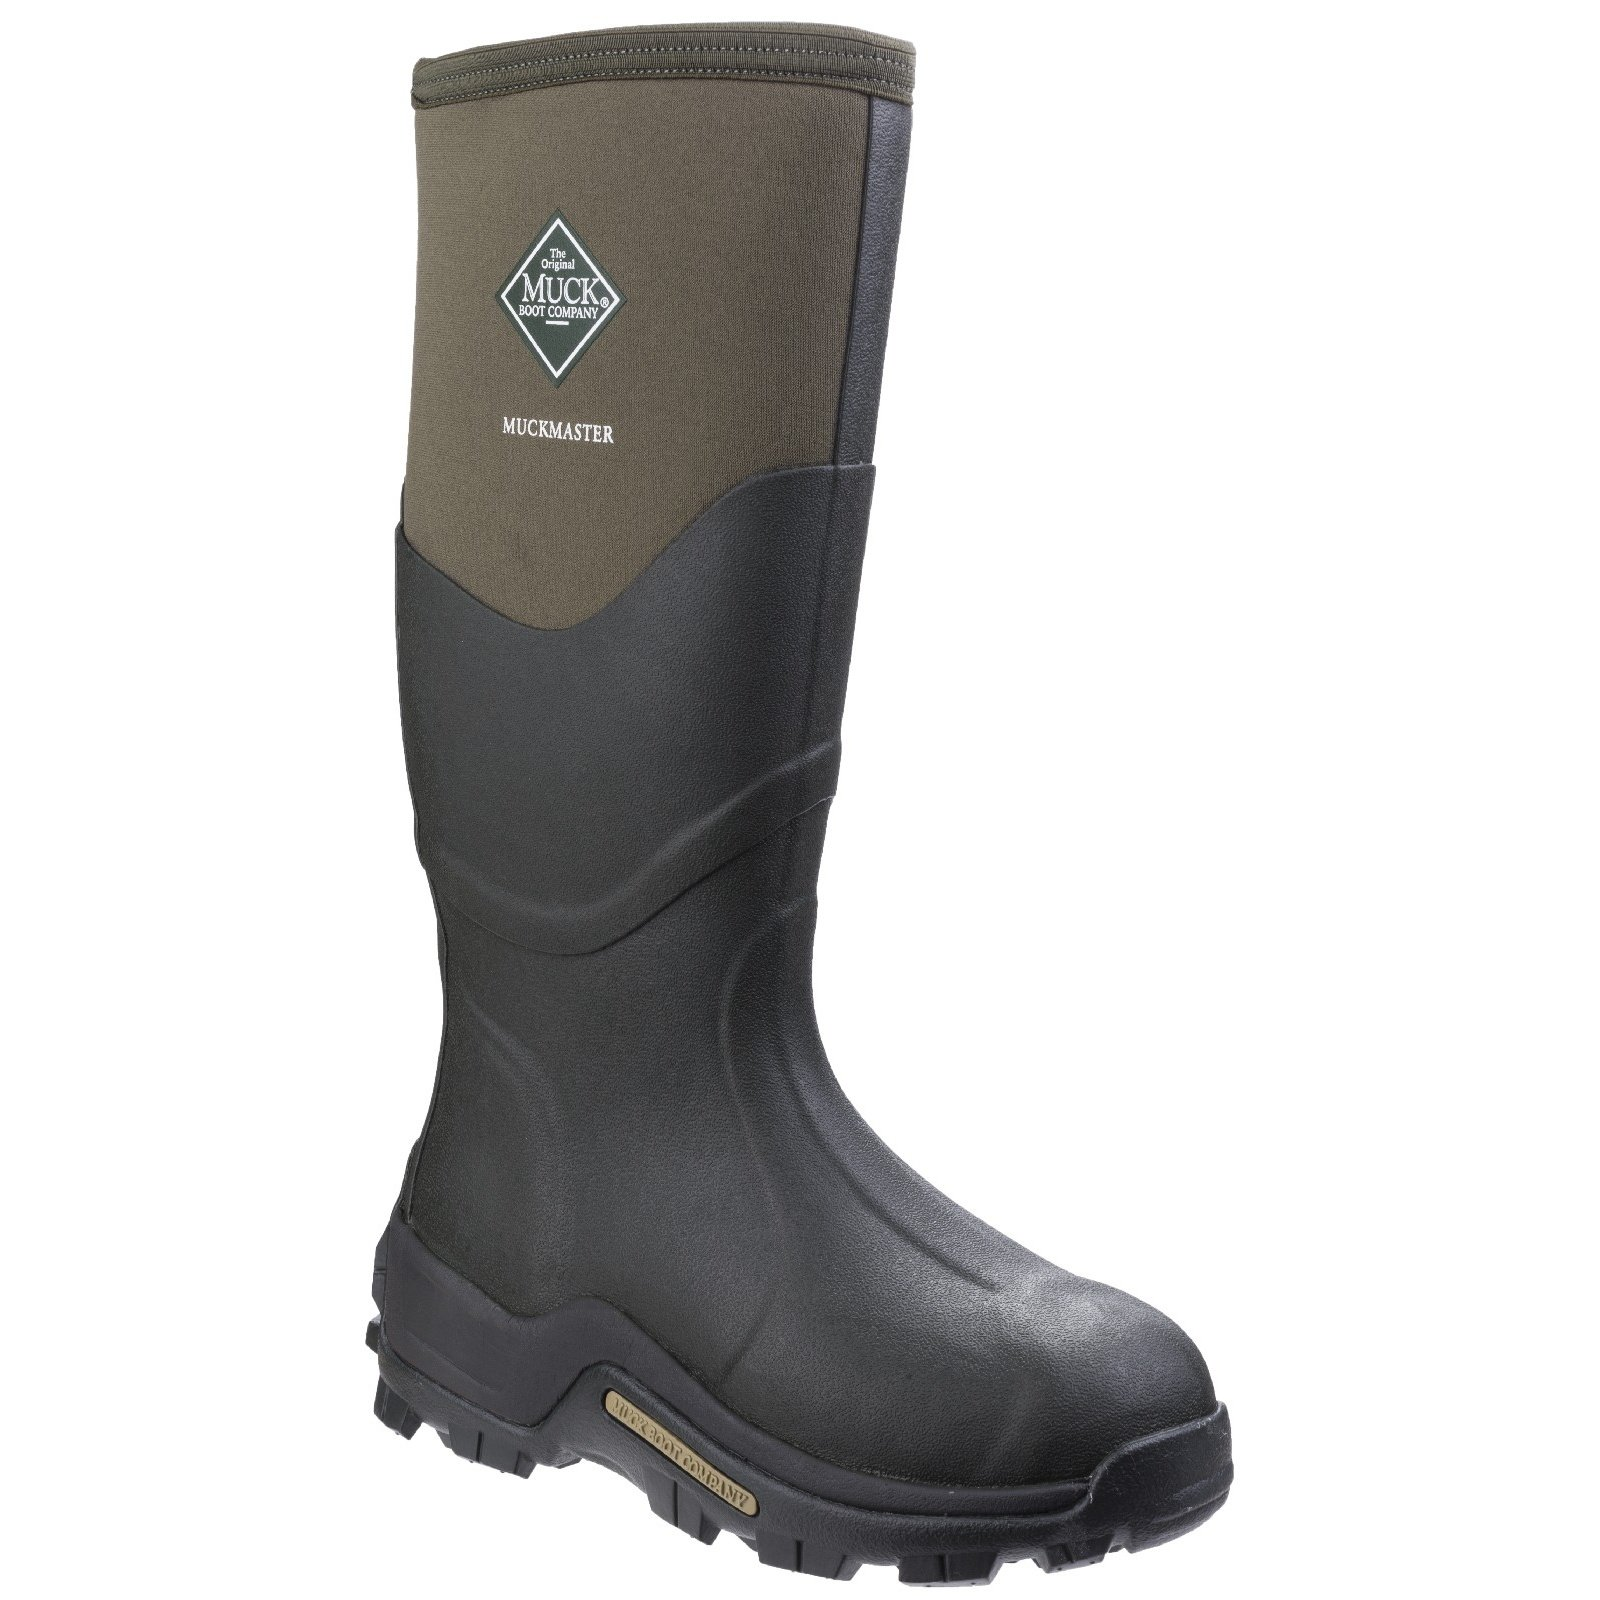 Muck Boot Unisex Muckmaster Hi Wellington Boots (10 M US / 11 W US) (Moss/Moss) by Muck Boot (Image #1)